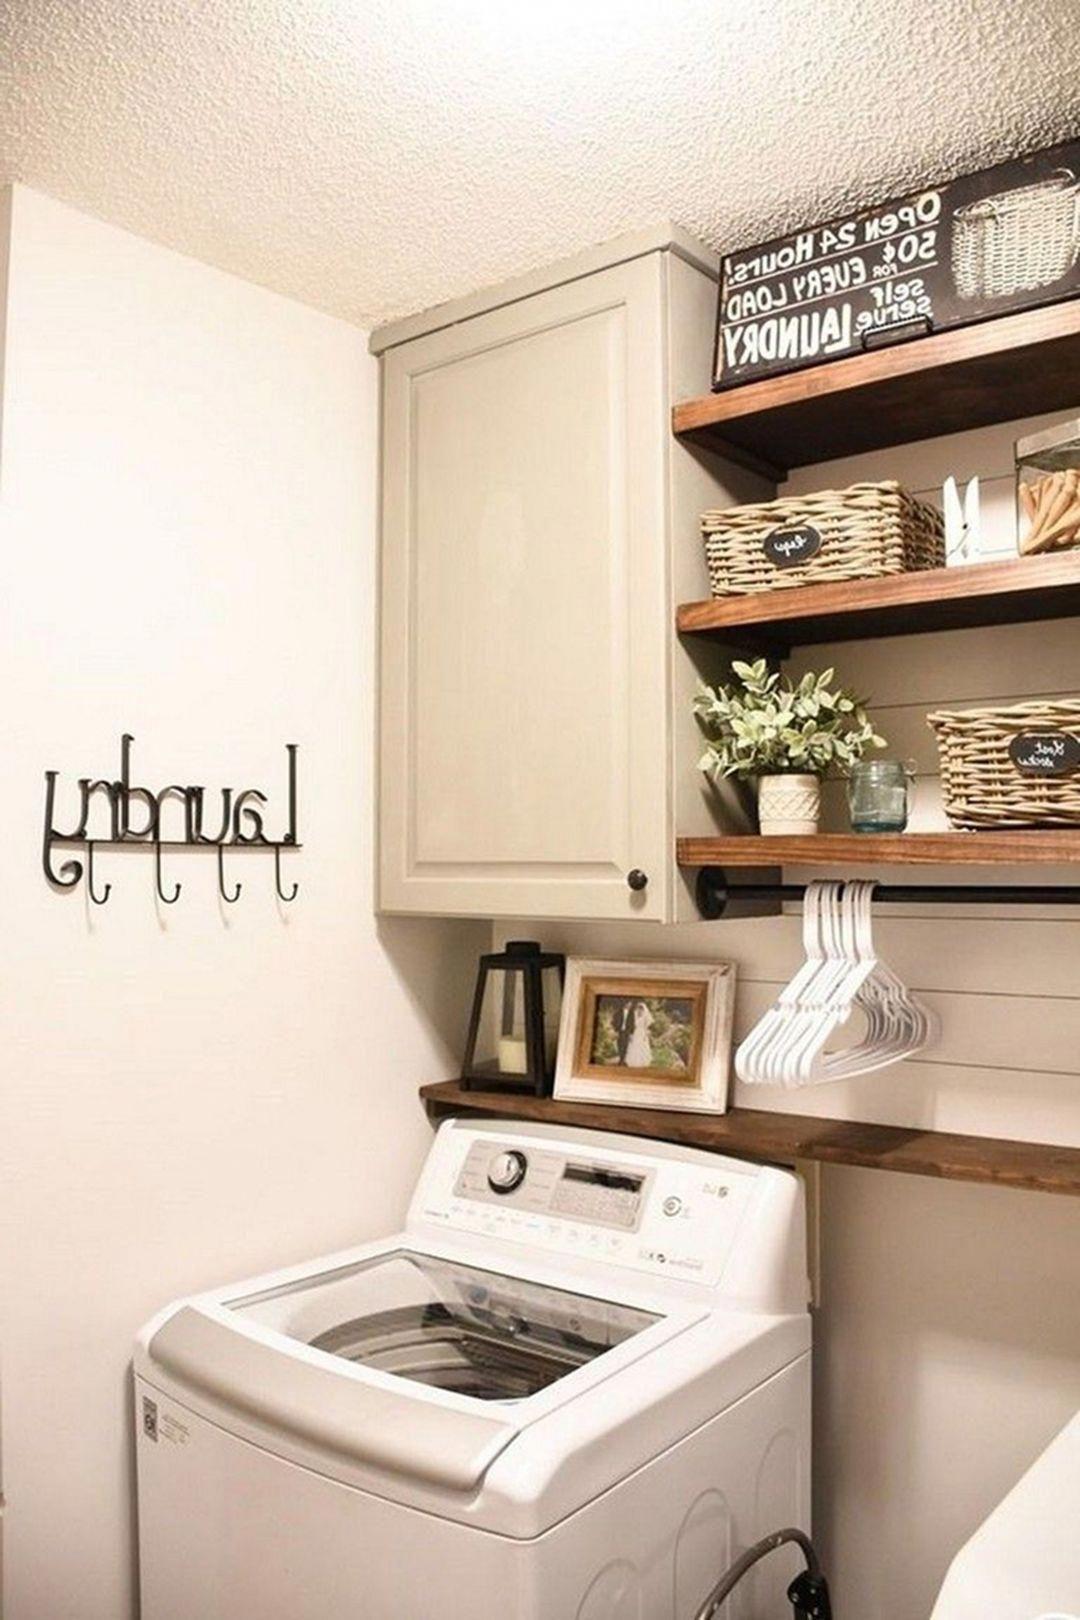 Bathroom Decor Ideas Cheap Diy Home Decor Ideas Elegant Home Decor On A Budget 20190626 Laundry Room Diy Laundry Room Decor Small Laundry Rooms